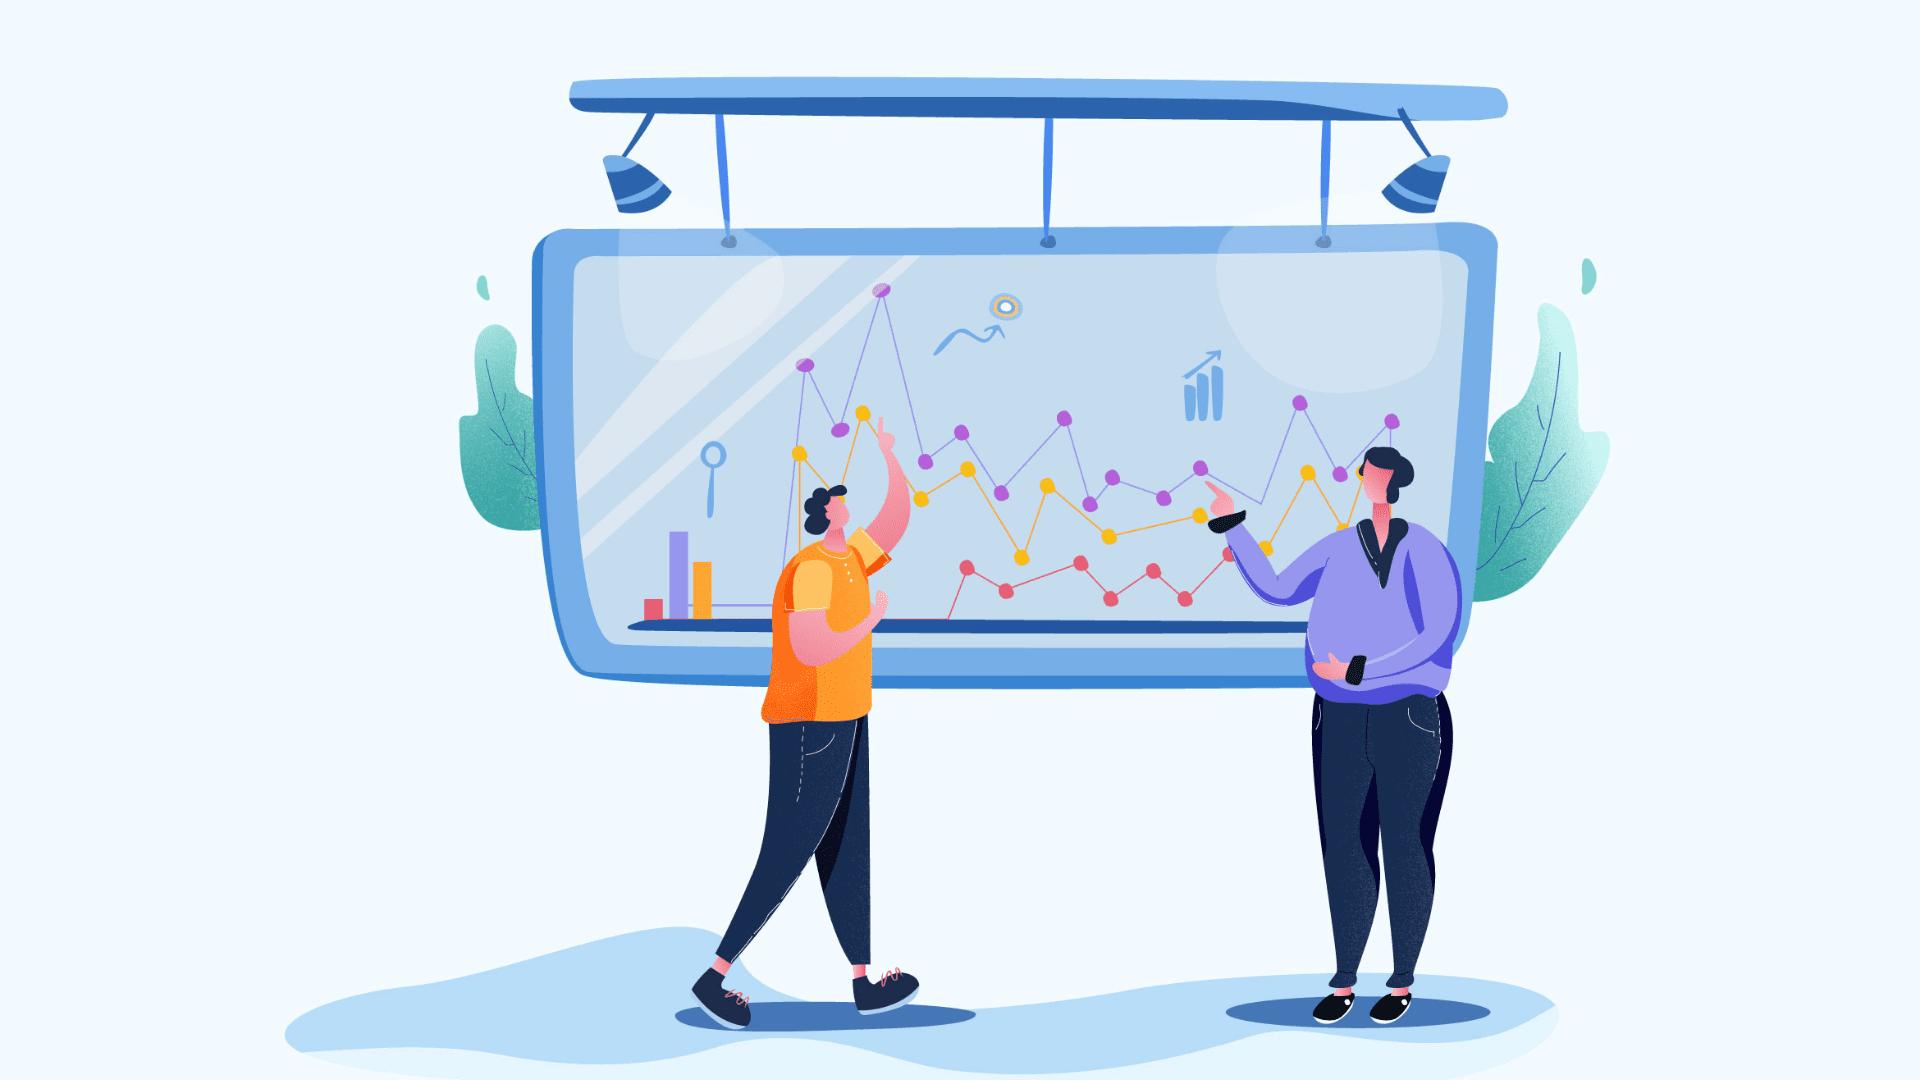 10 statistics to create an app